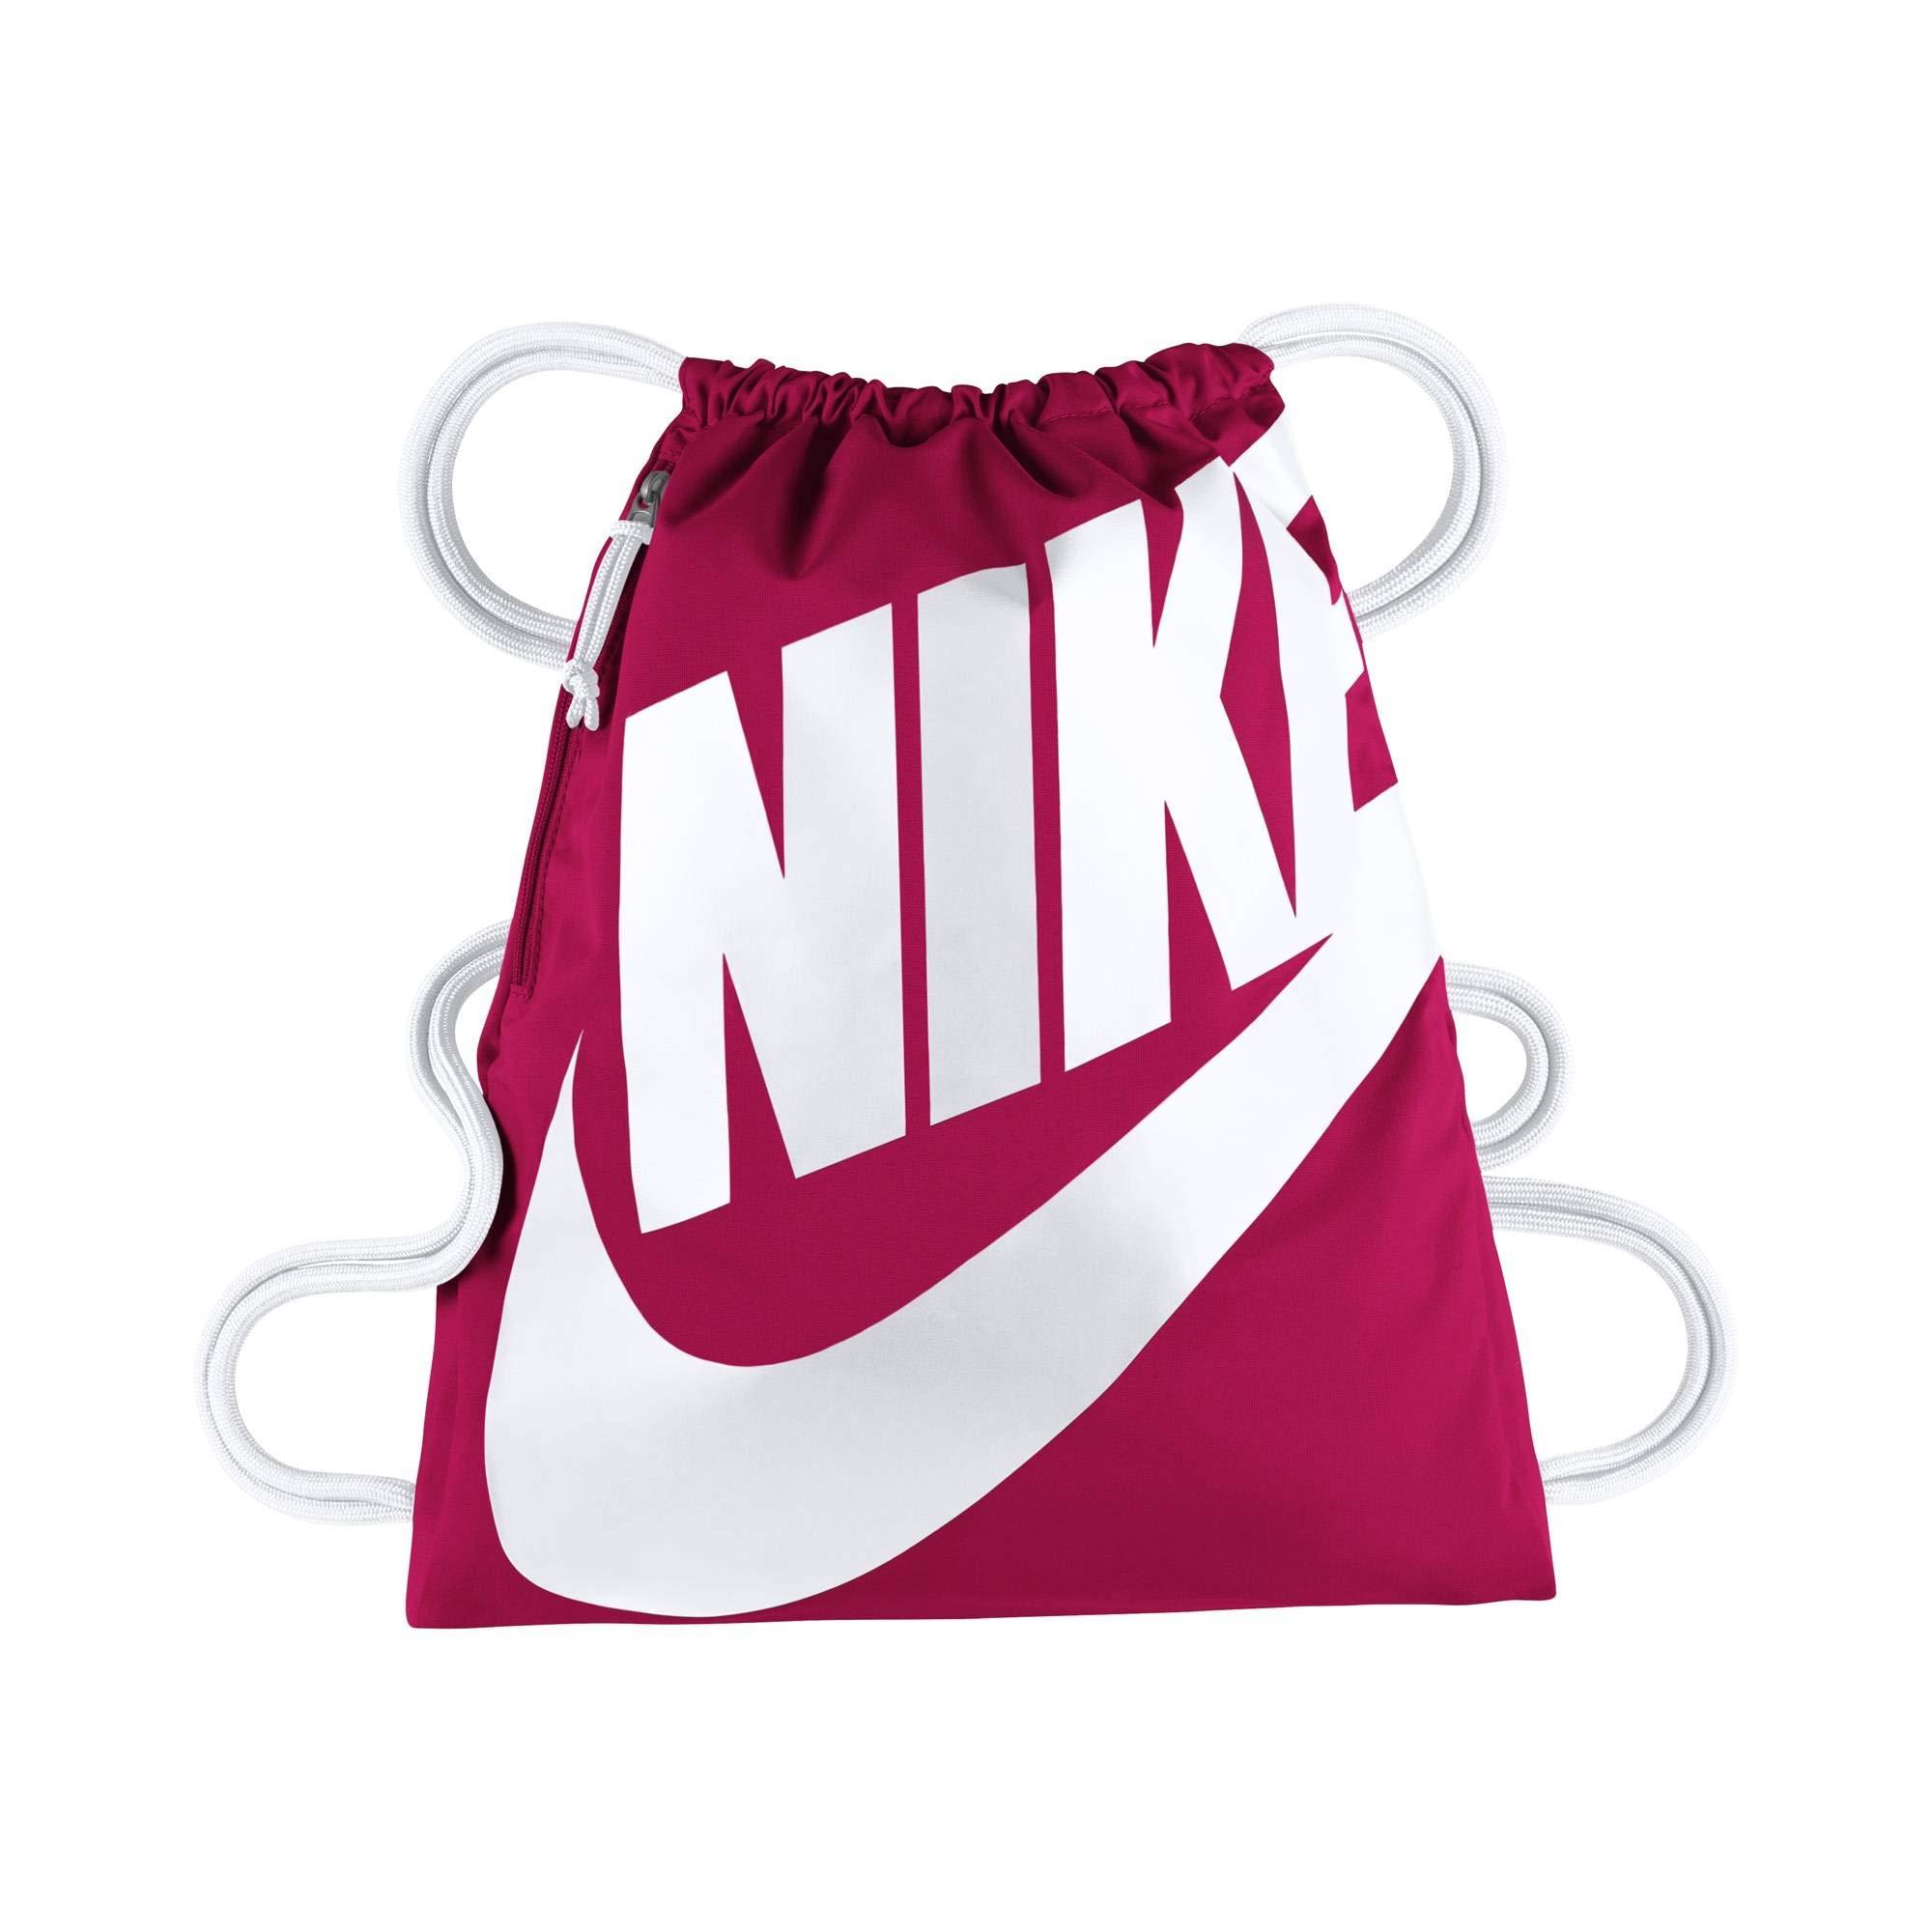 Gmsk Nike MochilaUnisex Escolares Online Heritage AdultoMochilas 4Rjq3LA5